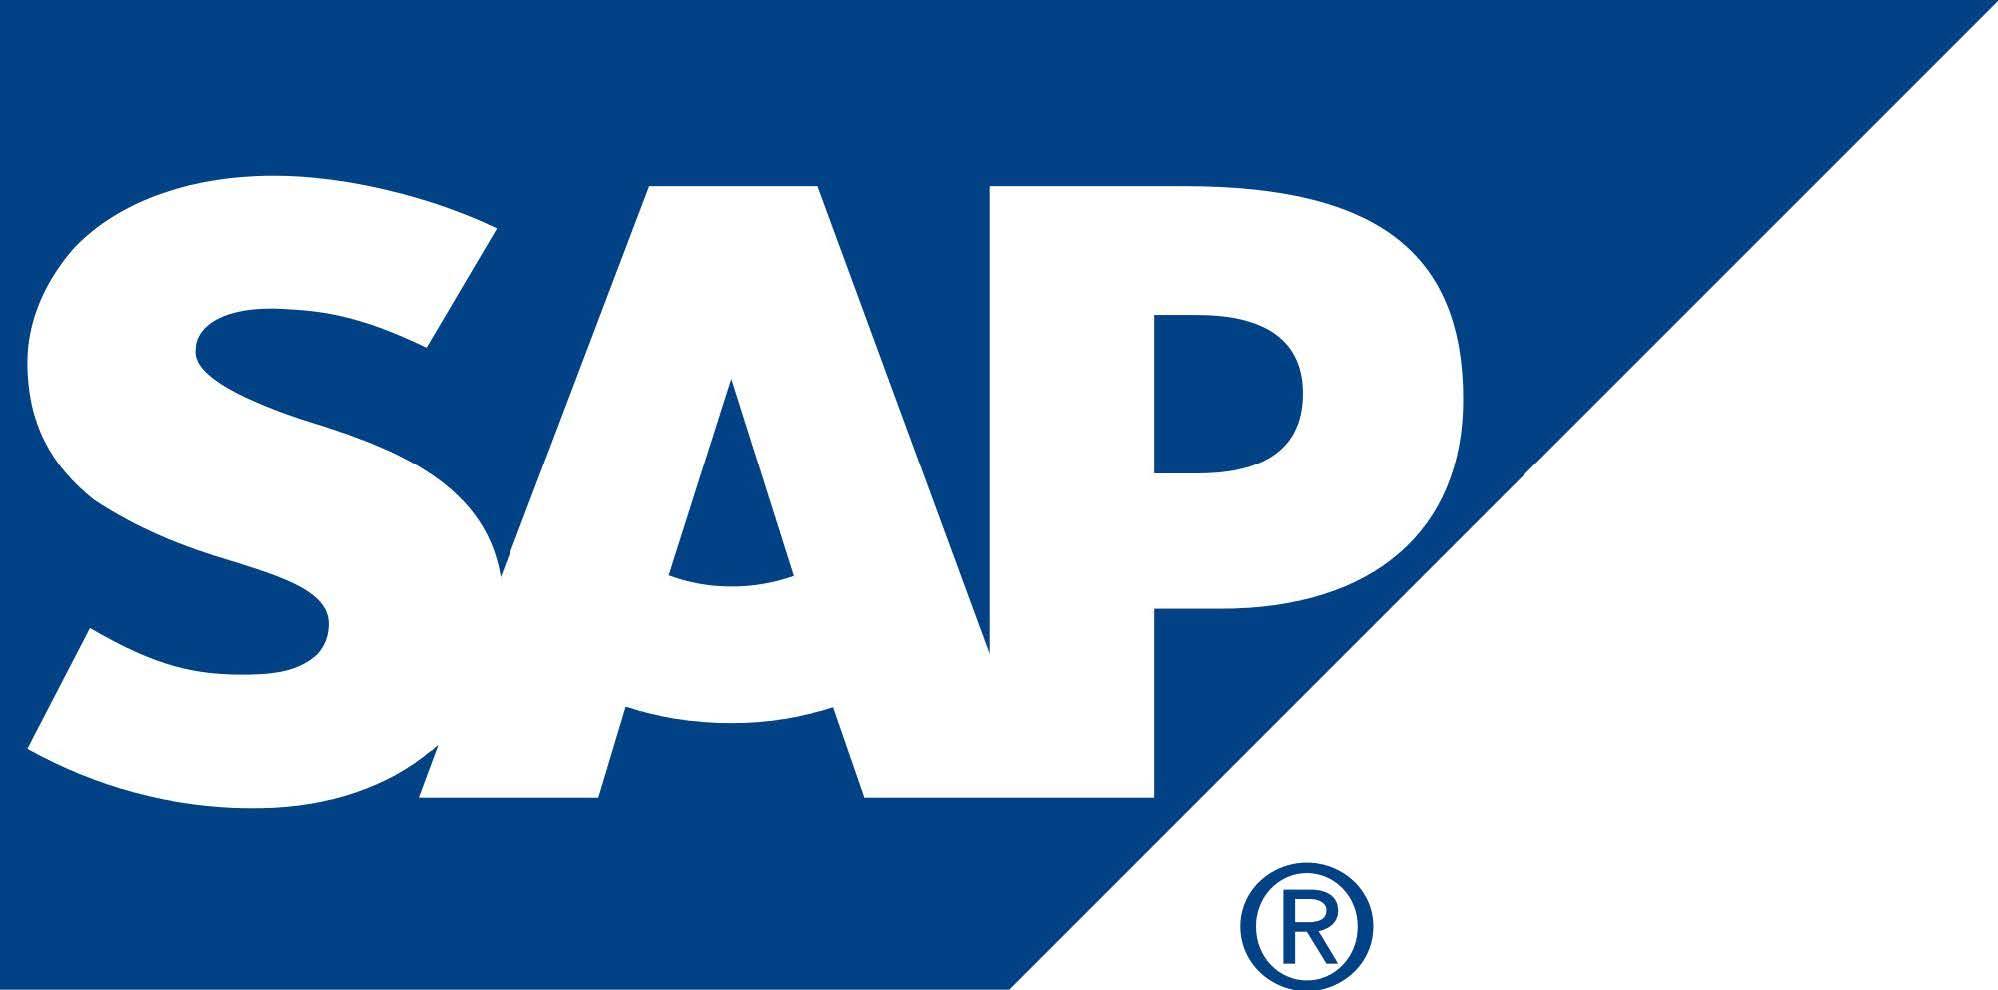 SAP Enterprise Resource Planning Technology | Hollingsworth